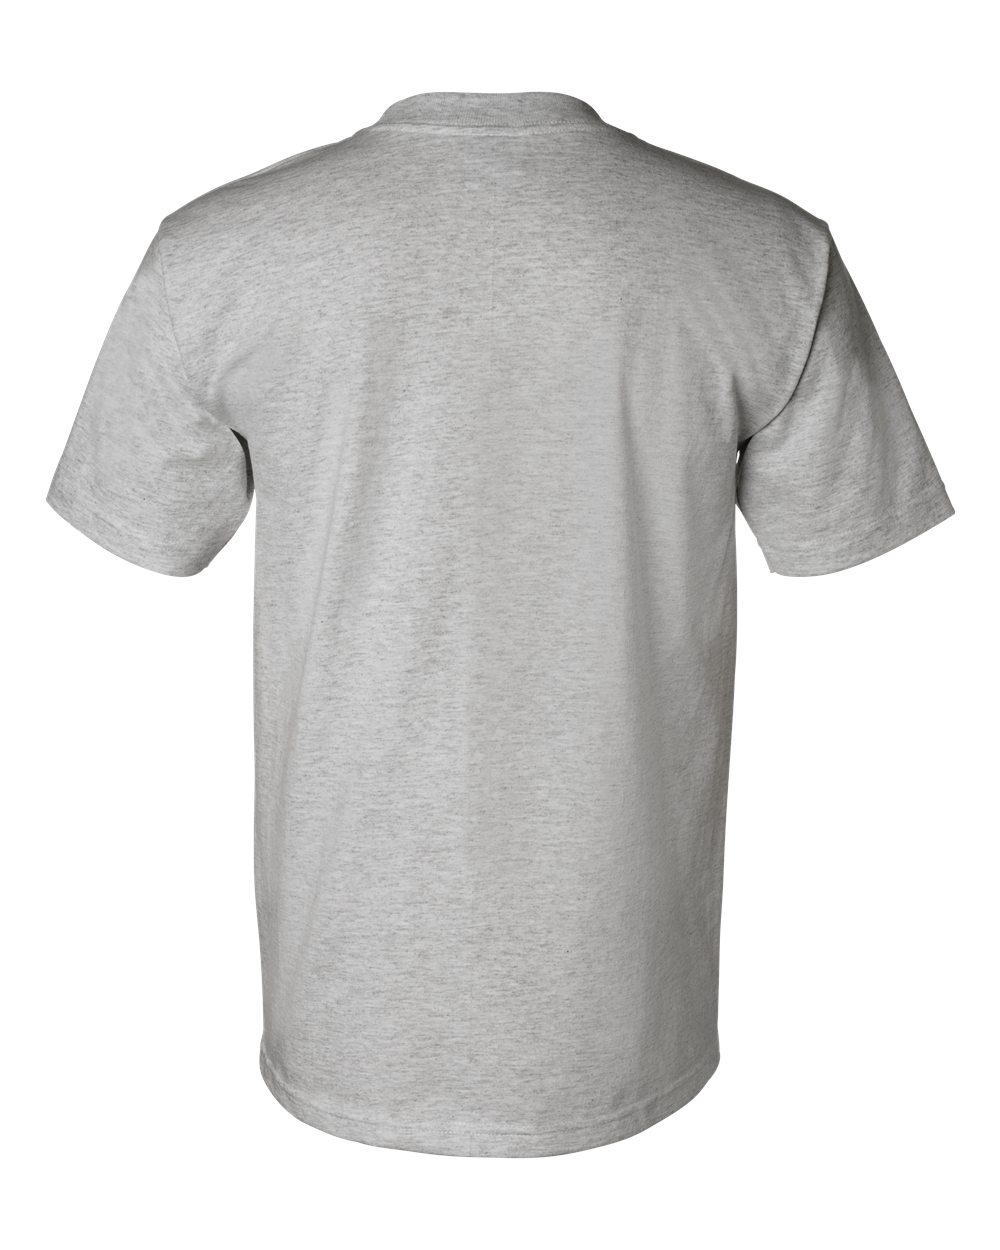 Bayside-Mens-Cotton-Blank-USA-Made-Short-Sleeve-T-Shirt-5100-up-to-5XL thumbnail 19